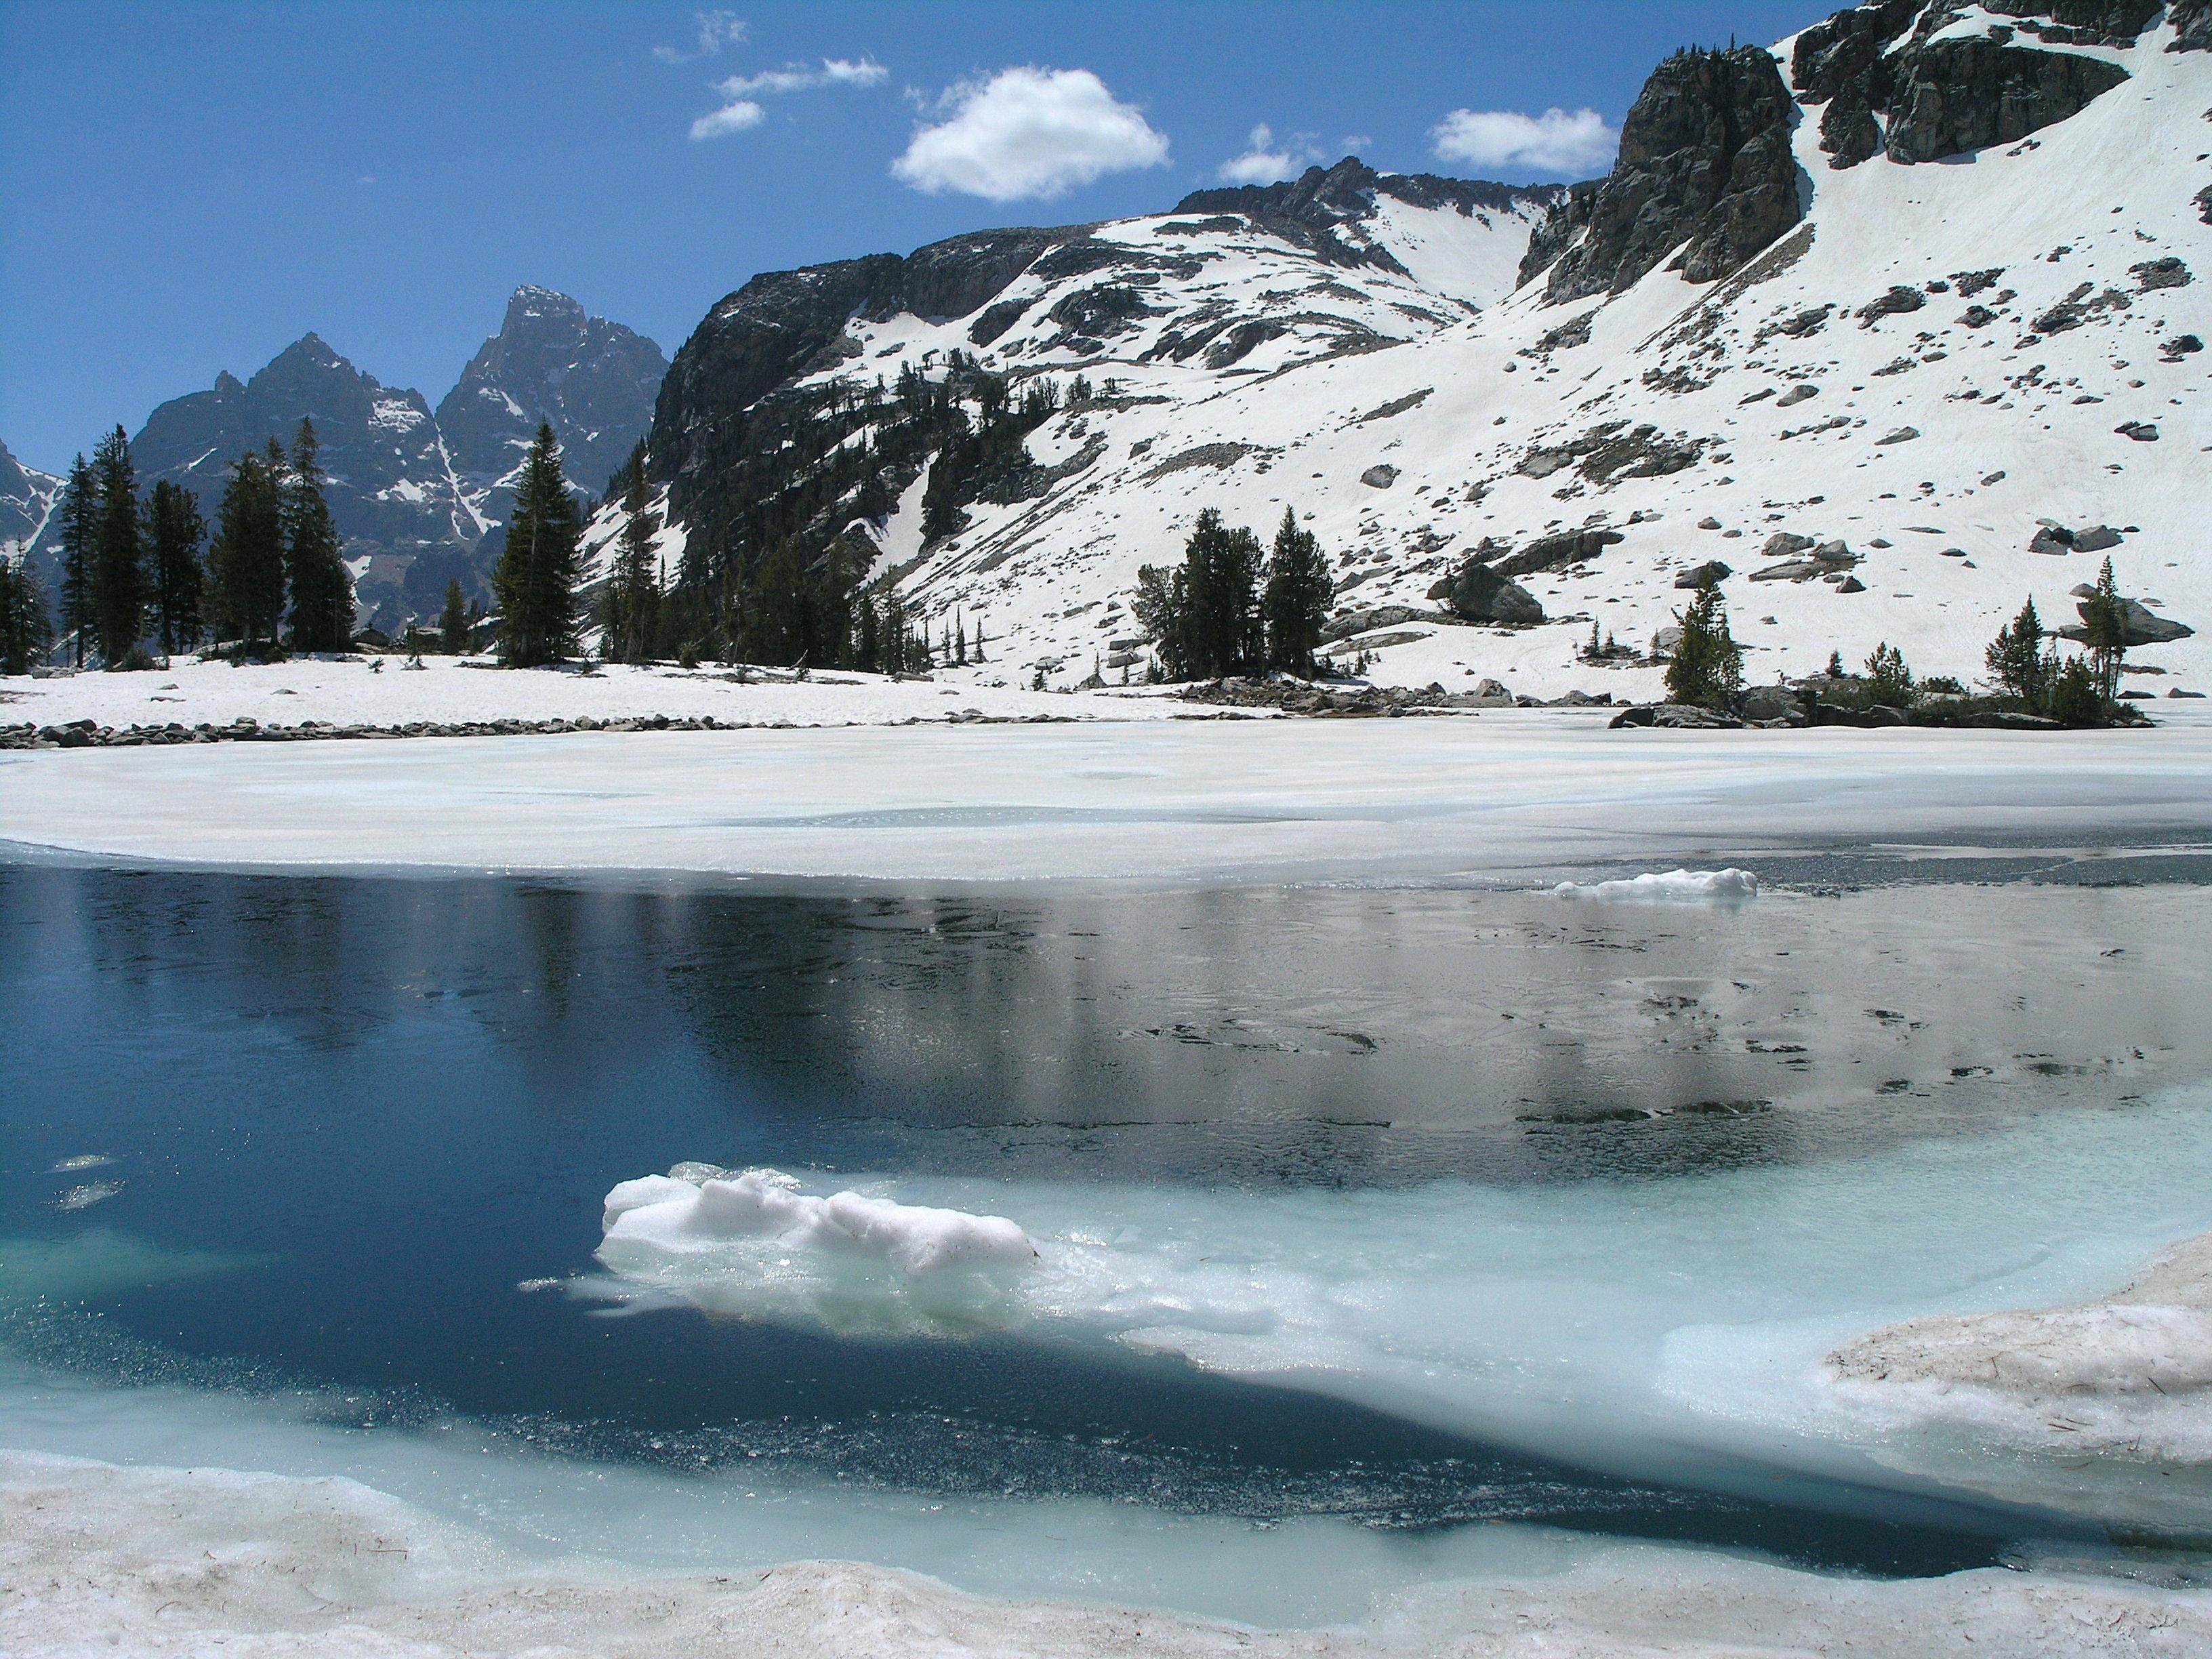 Lake Solitude landscape in winter in Grand Teton National Park.